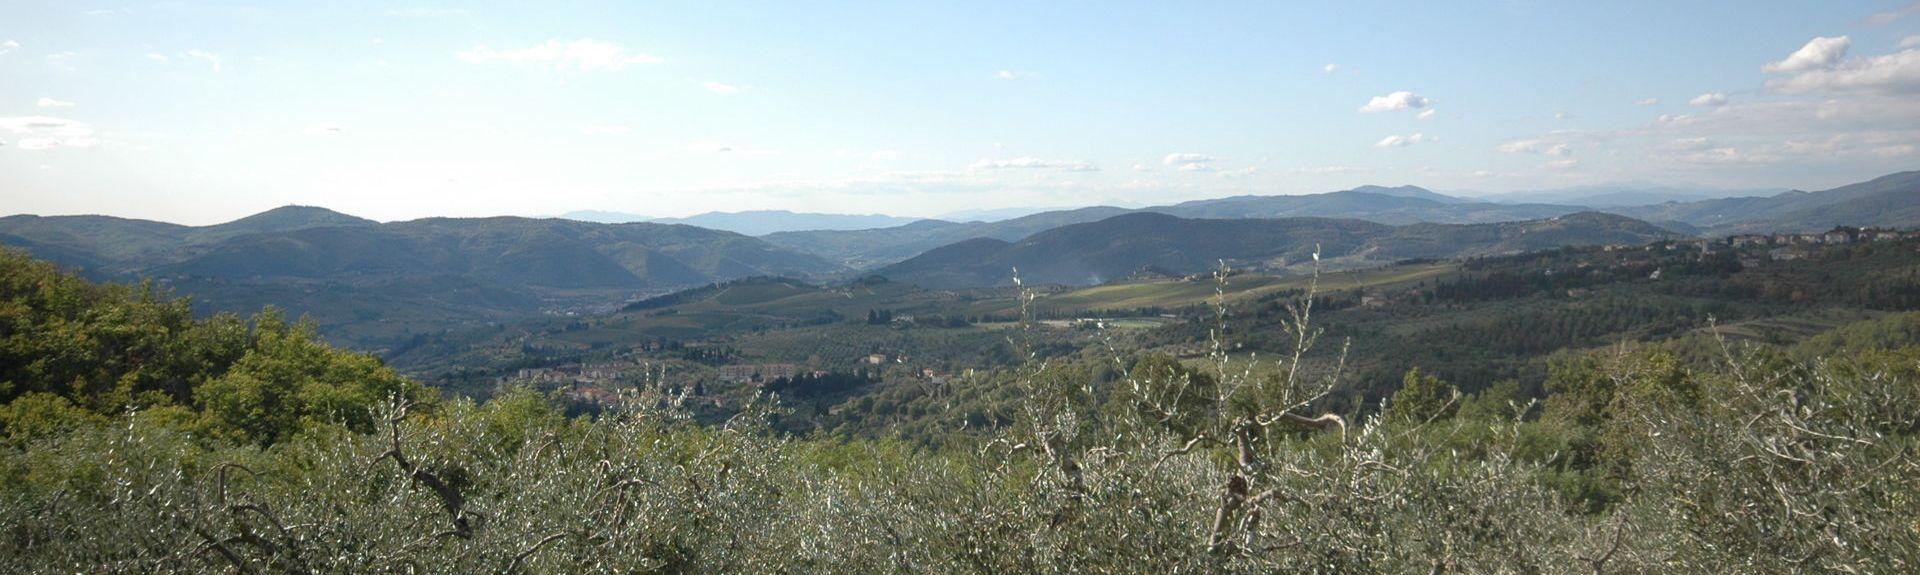 Mugello, Borgo San Lorenzo, Toskania, Włochy